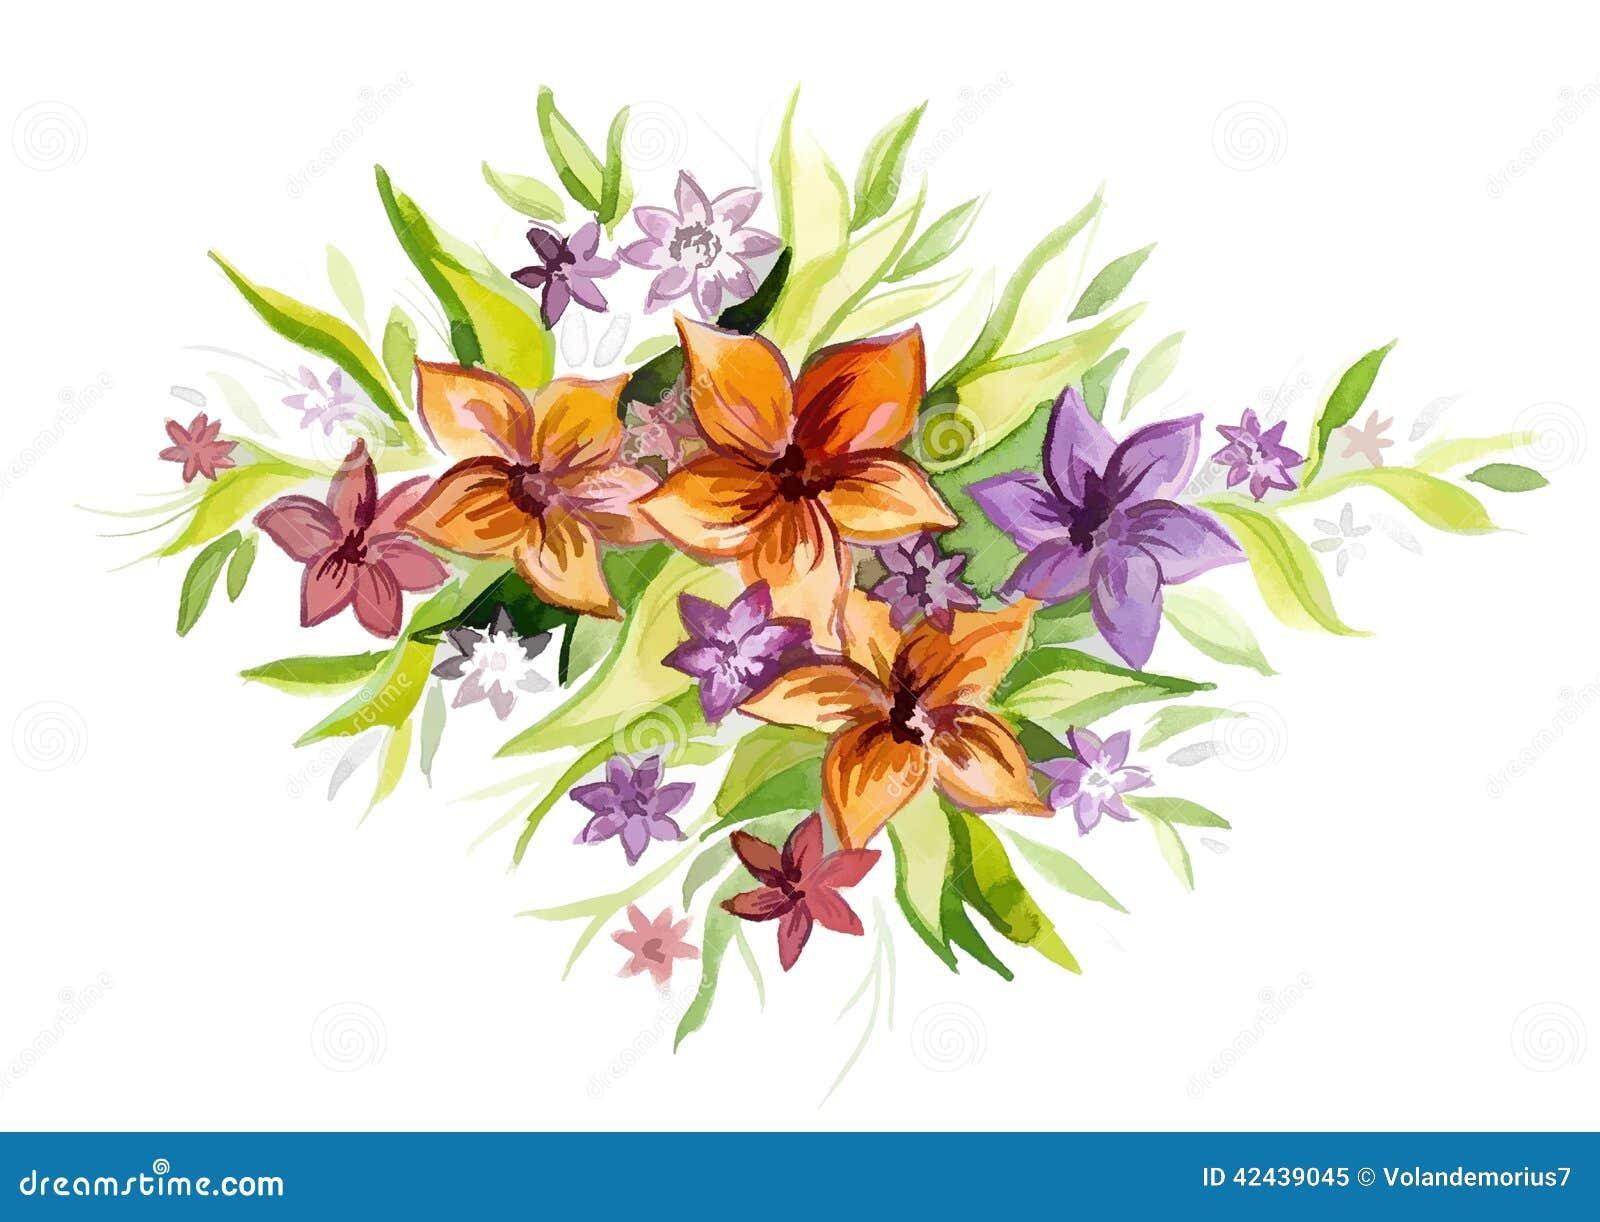 Ramo hermoso de flores de diversas formas